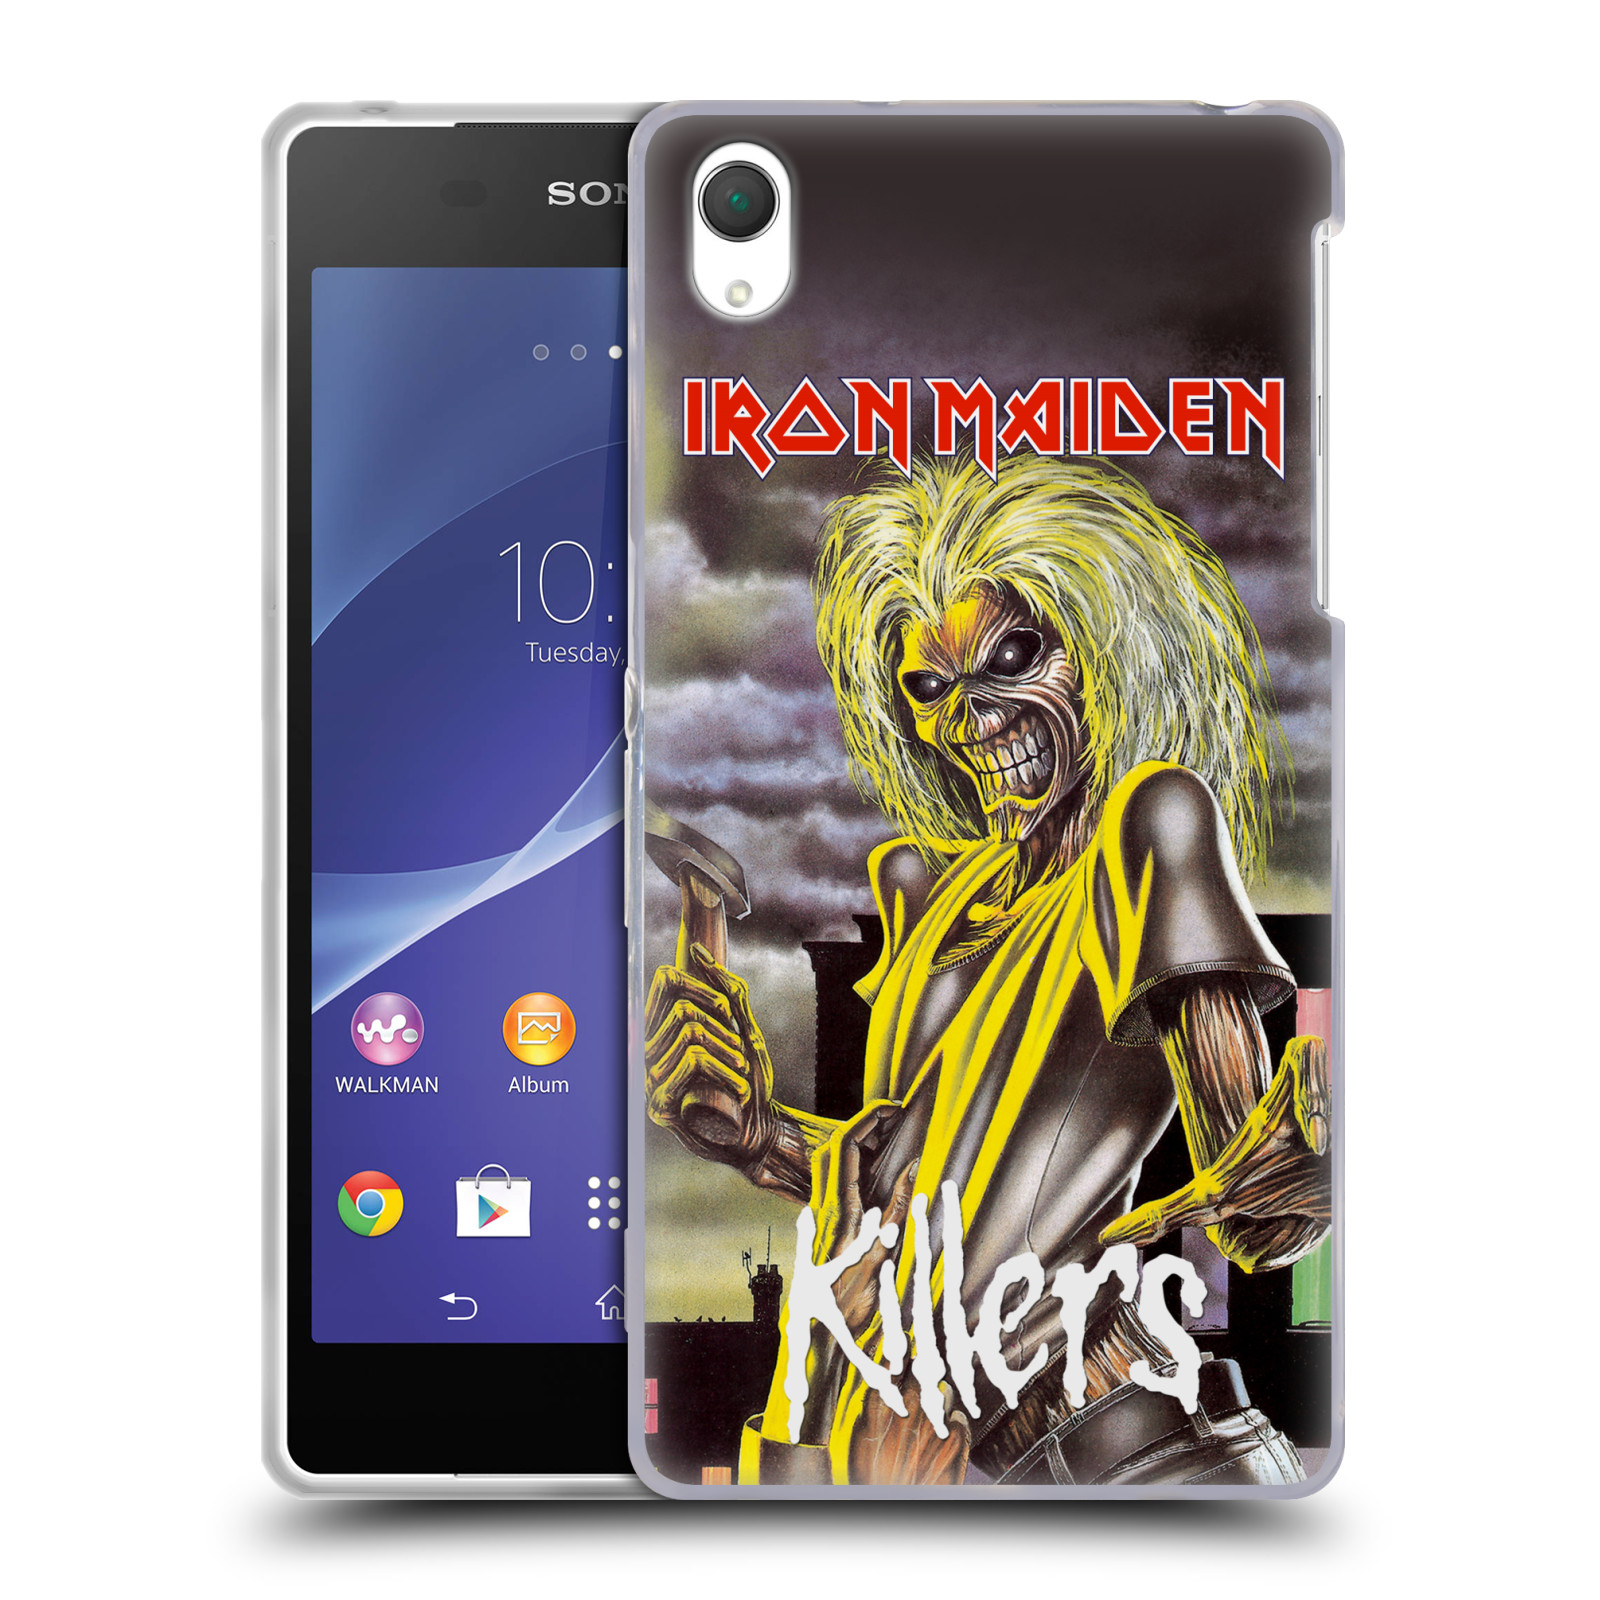 Silikonové pouzdro na mobil Sony Xperia Z2 D6503 HEAD CASE - Iron Maiden - Killers (Silikonový kryt či obal na mobilní telefon s licencovaným motivem Iron Maiden Sony Xperia Z2)